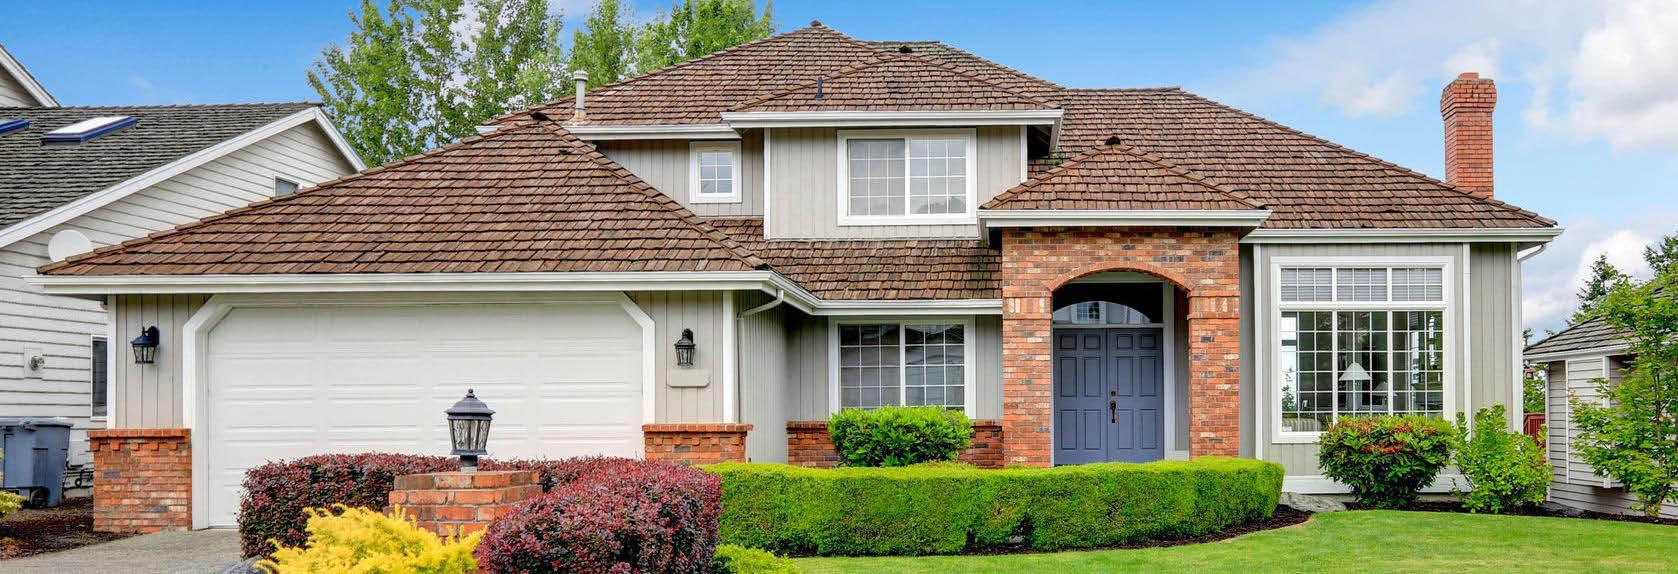 modelist group, valpak, roofing, siding, windows, philadelphia, exteriors